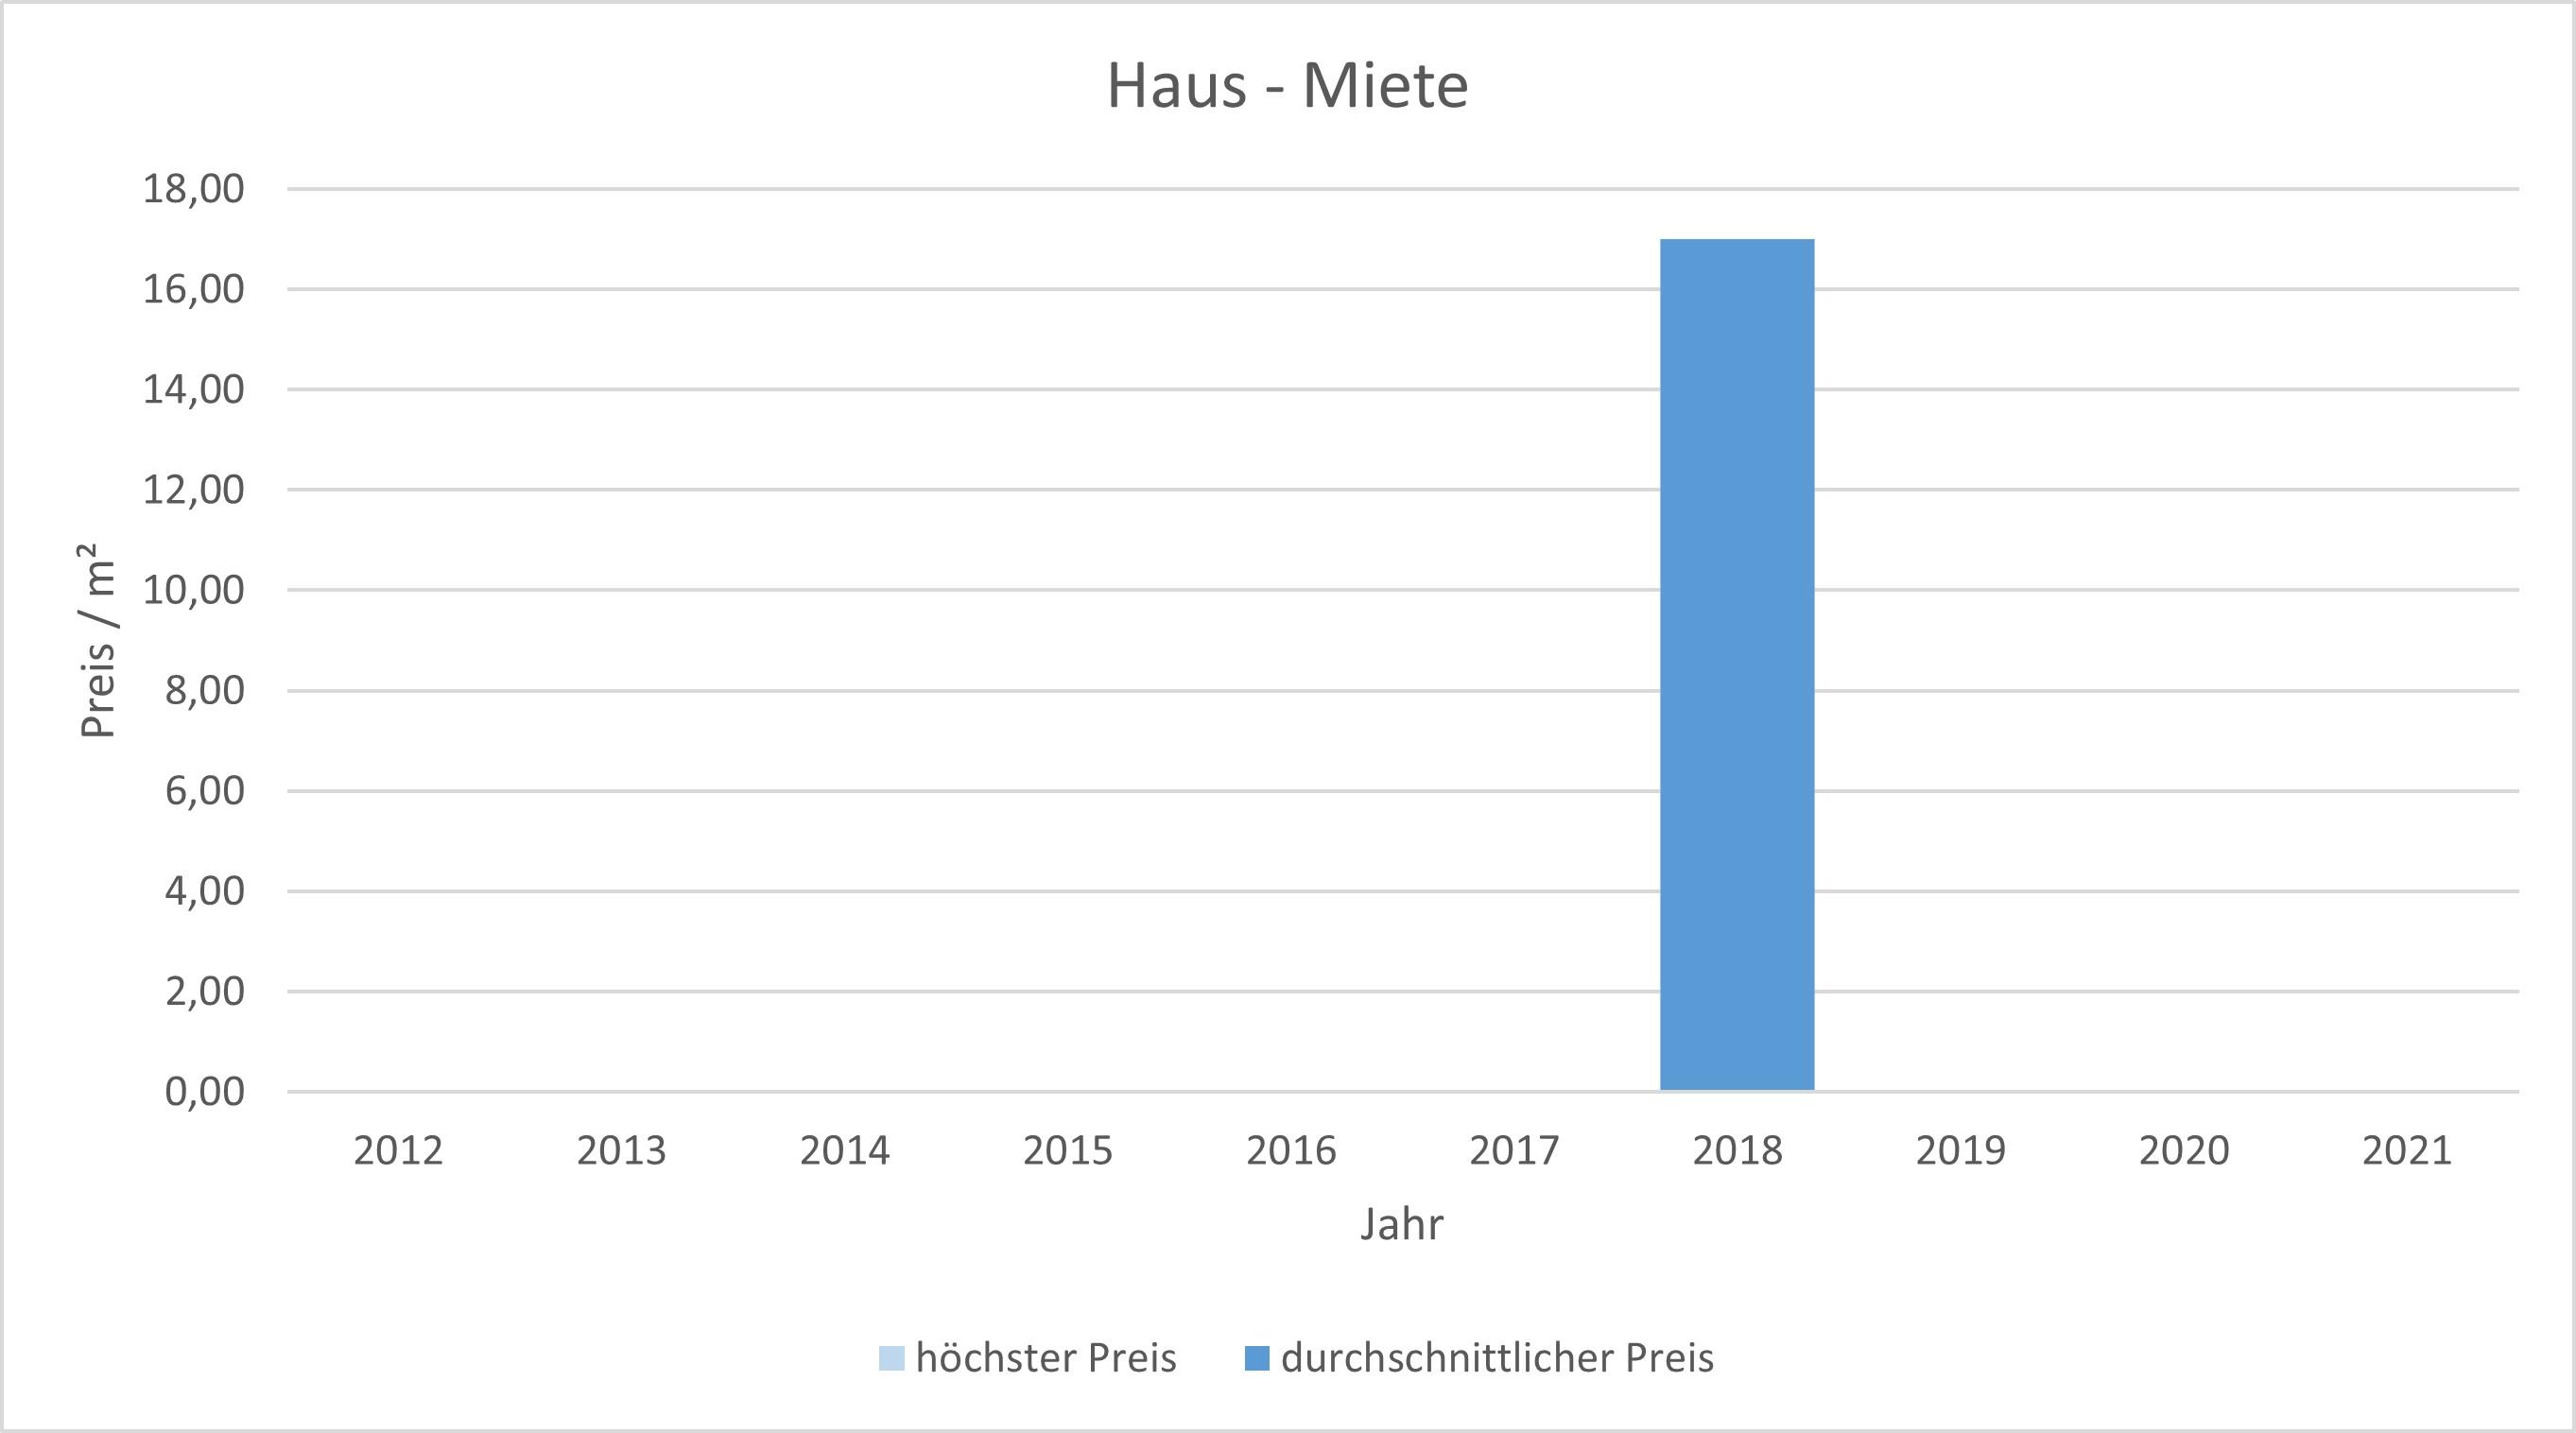 München - Giesing Haus mieten vermieten Preis Bewertung Makler www.happy-immo.de 2019 2020 2021